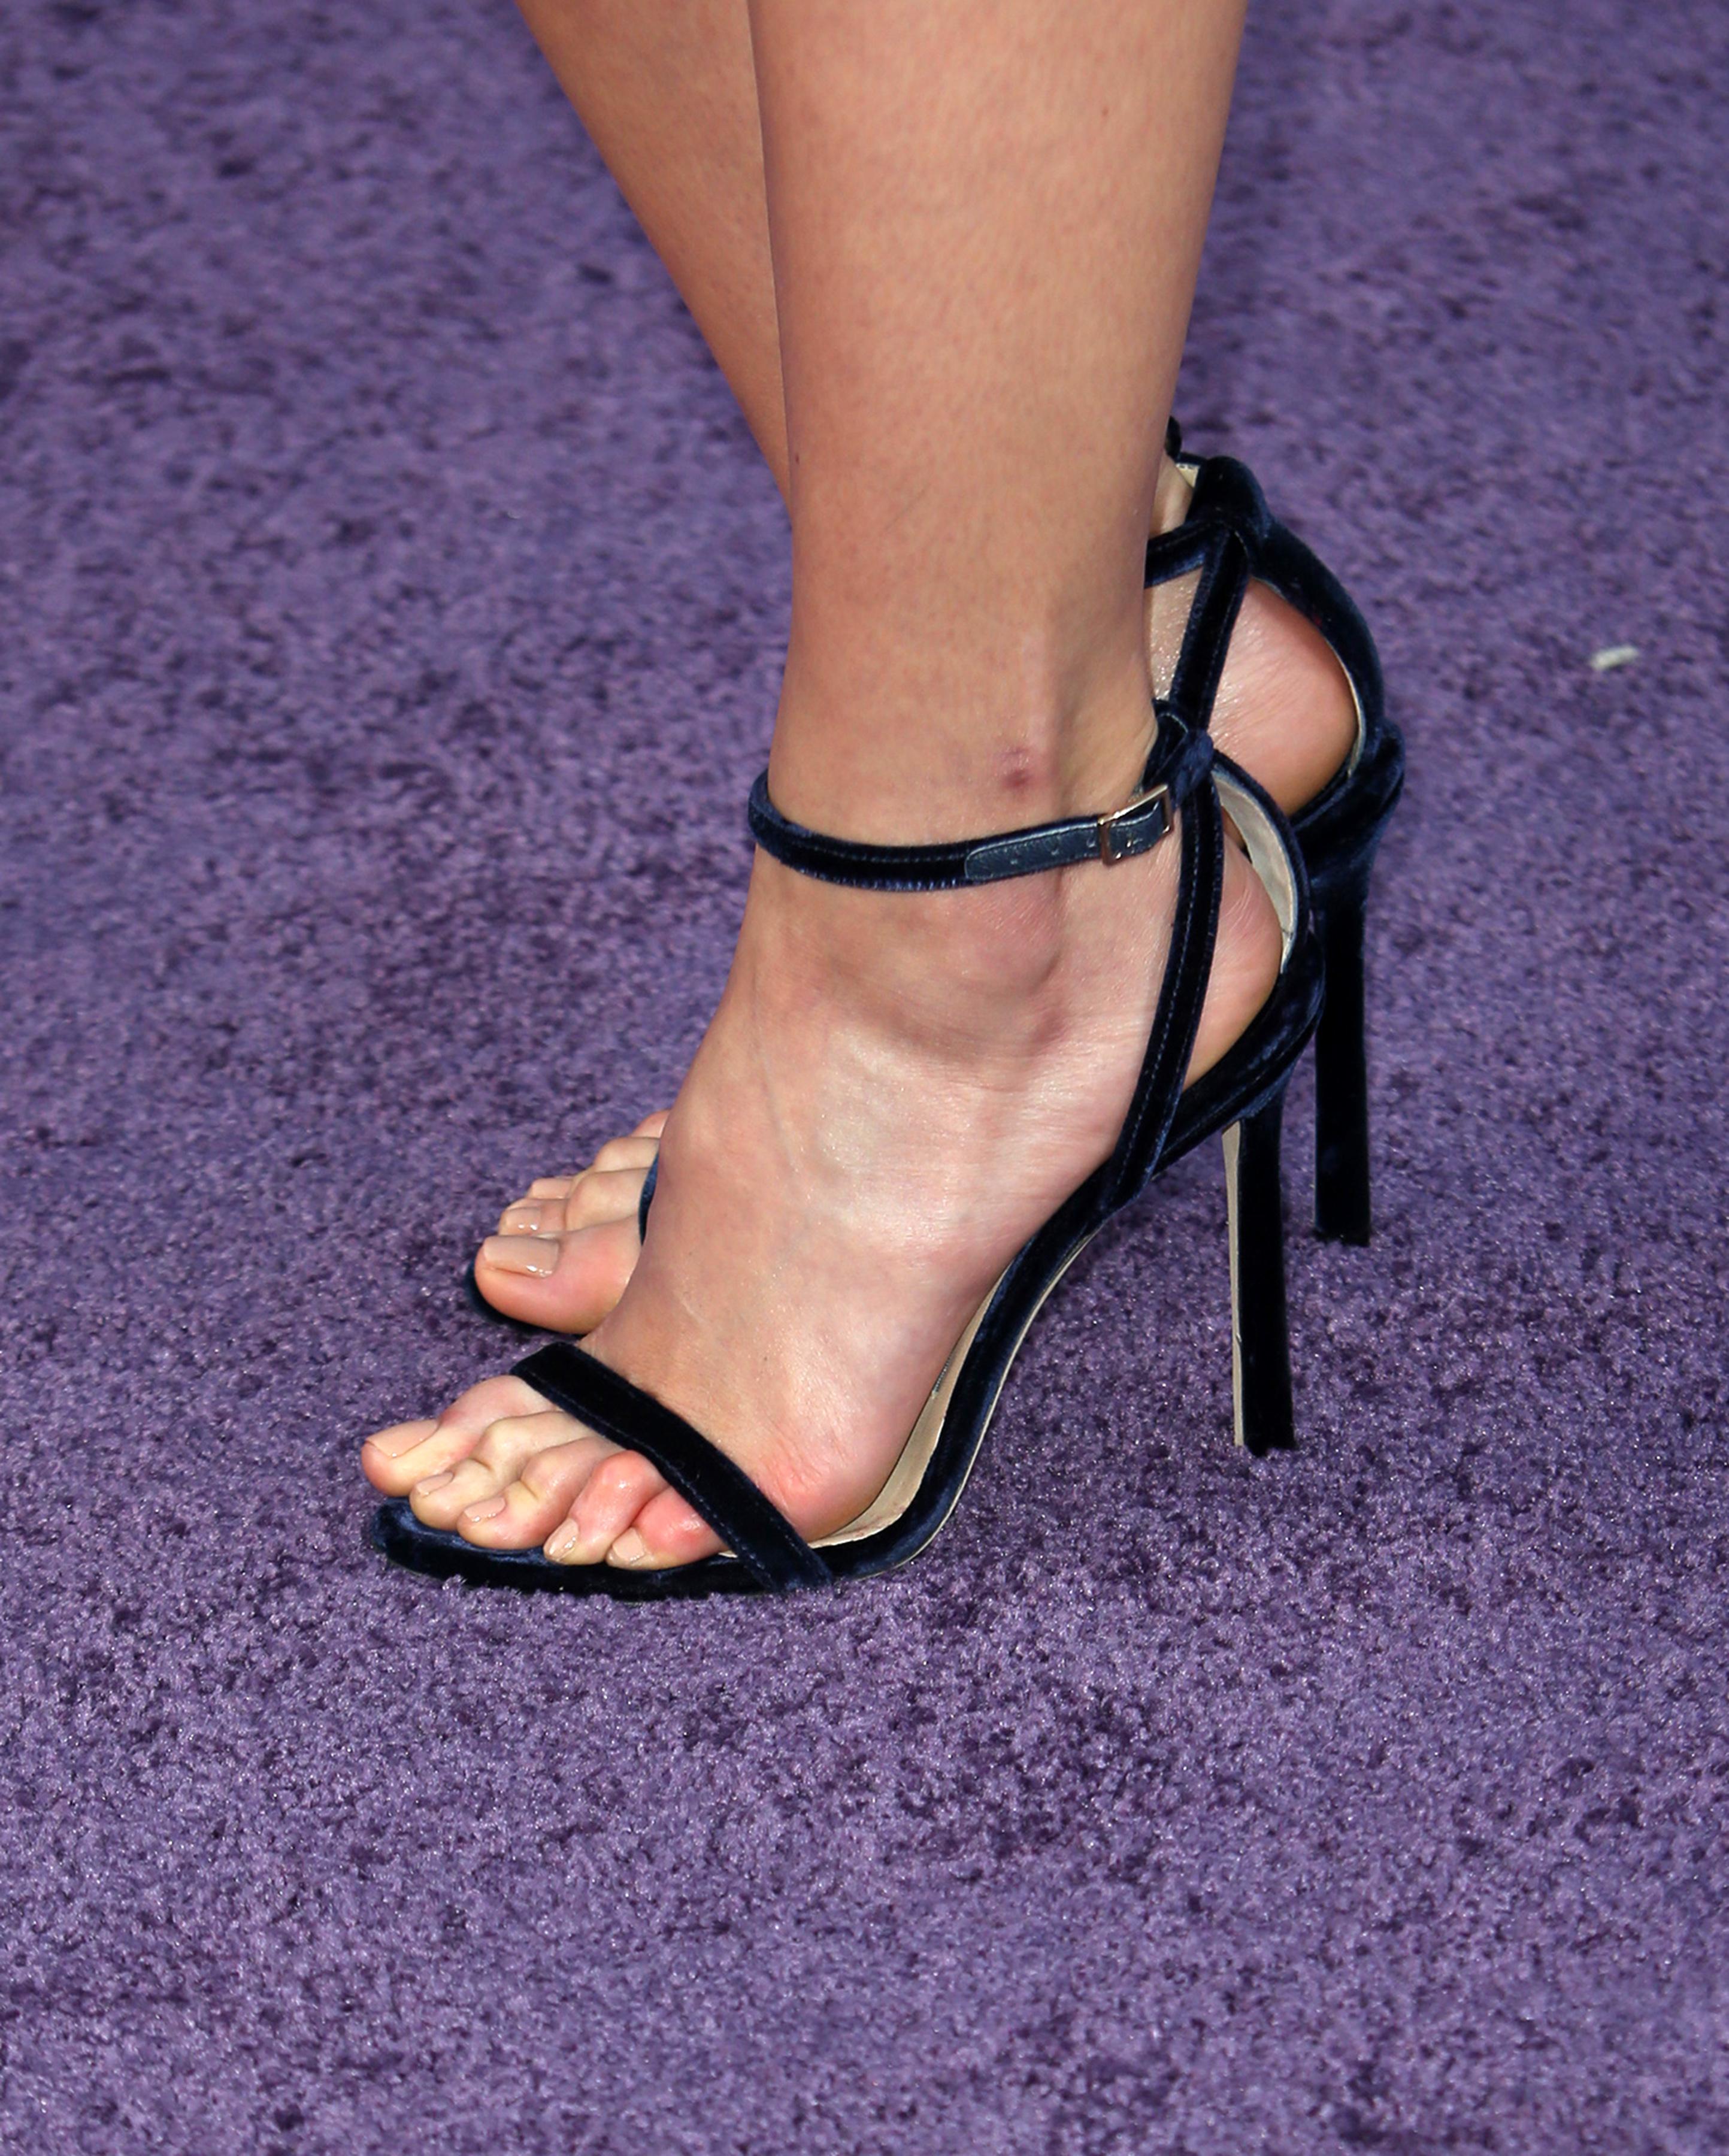 Feet Pom Klementieff